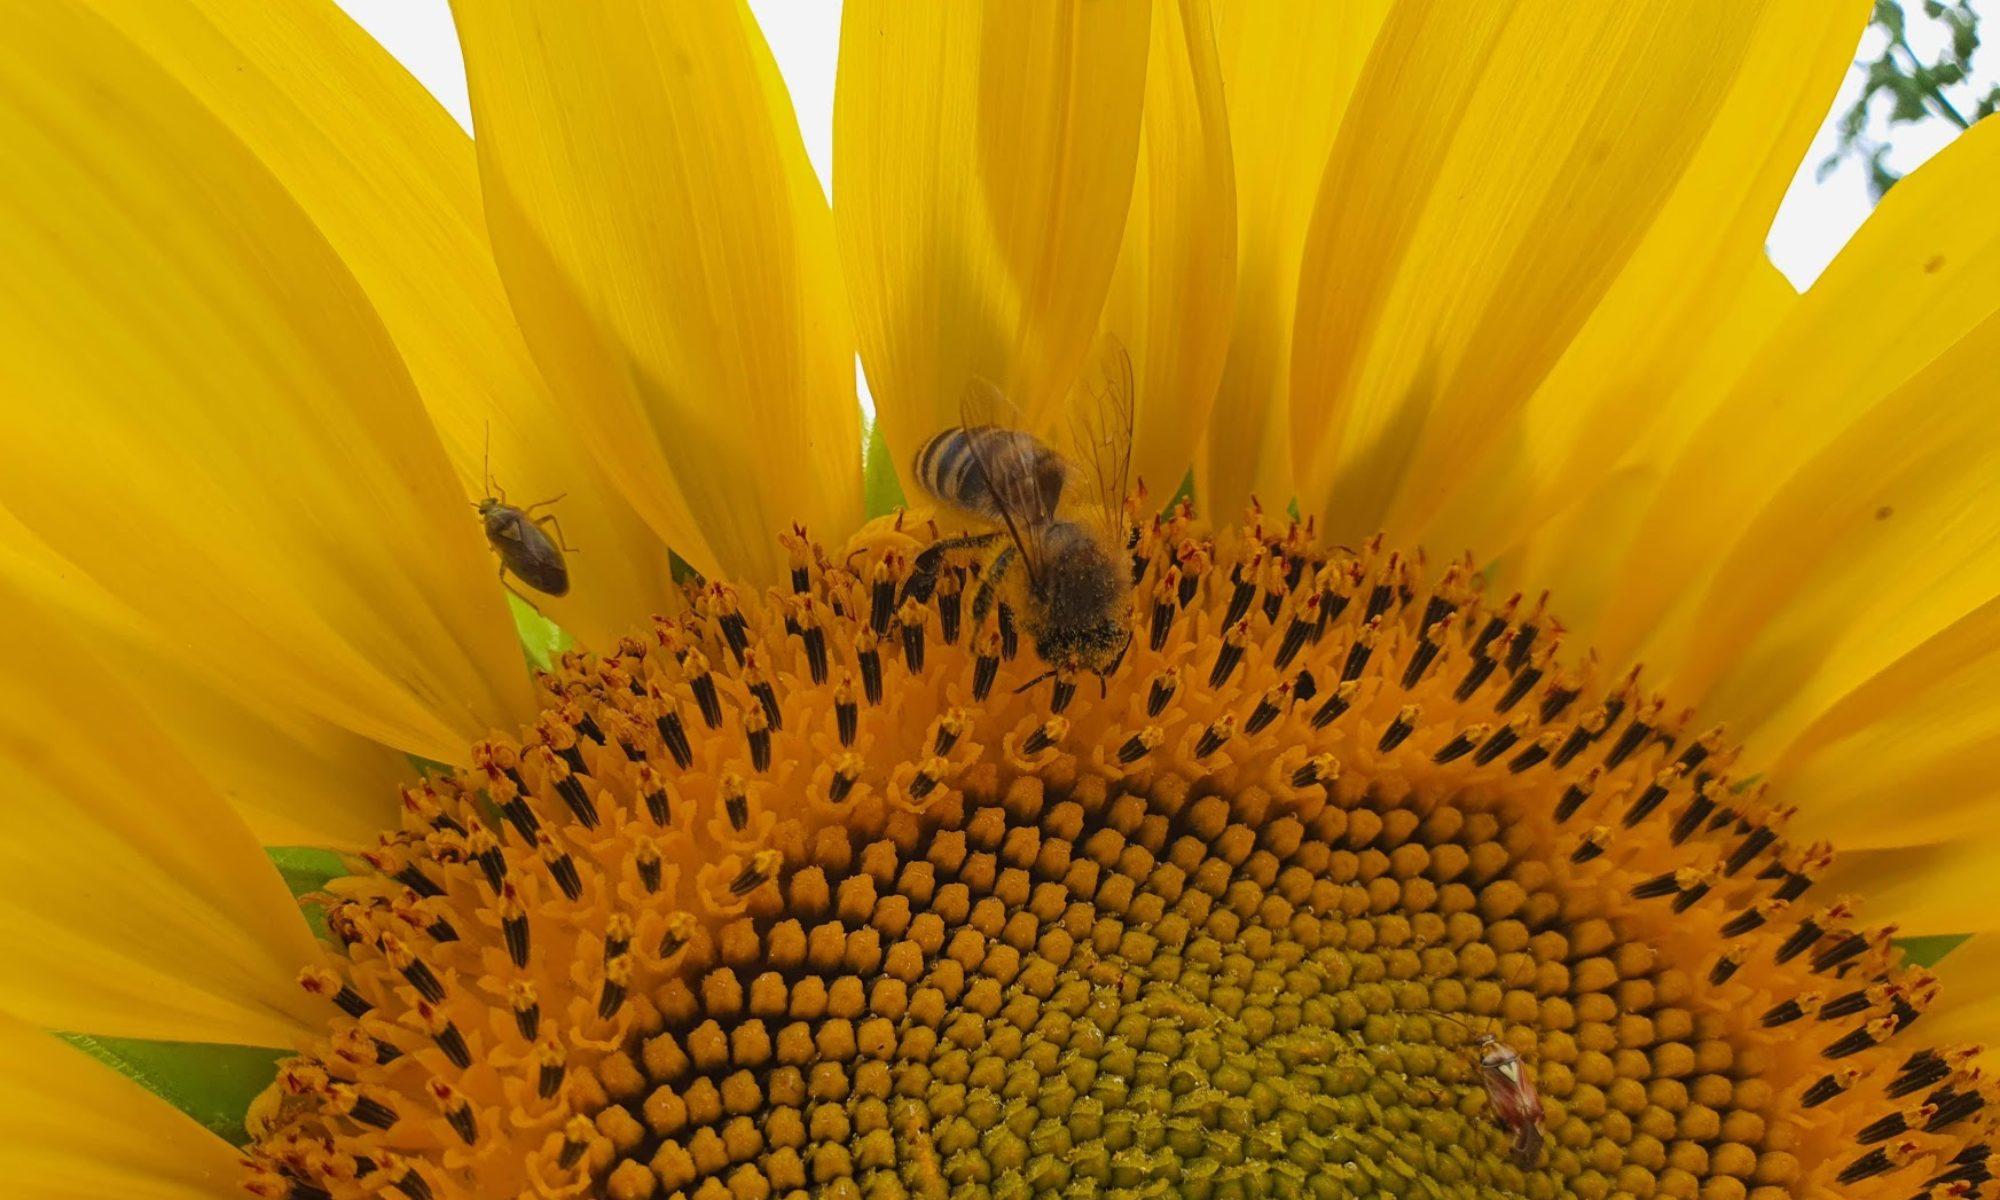 Smart Hive Technologies